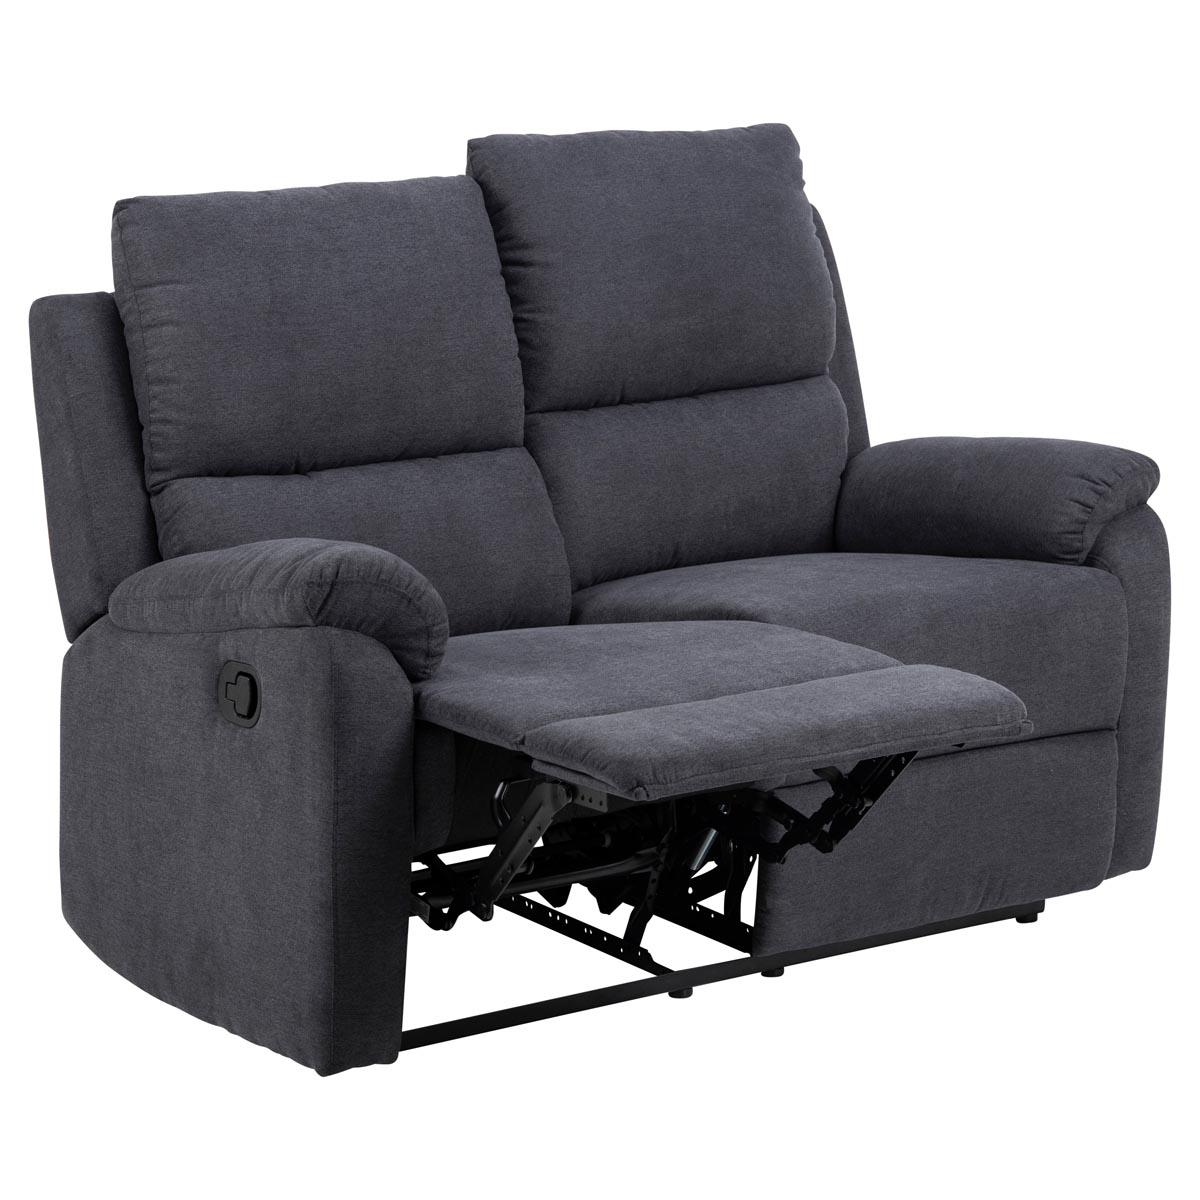 Smogen-2sits-recliner-fotstod